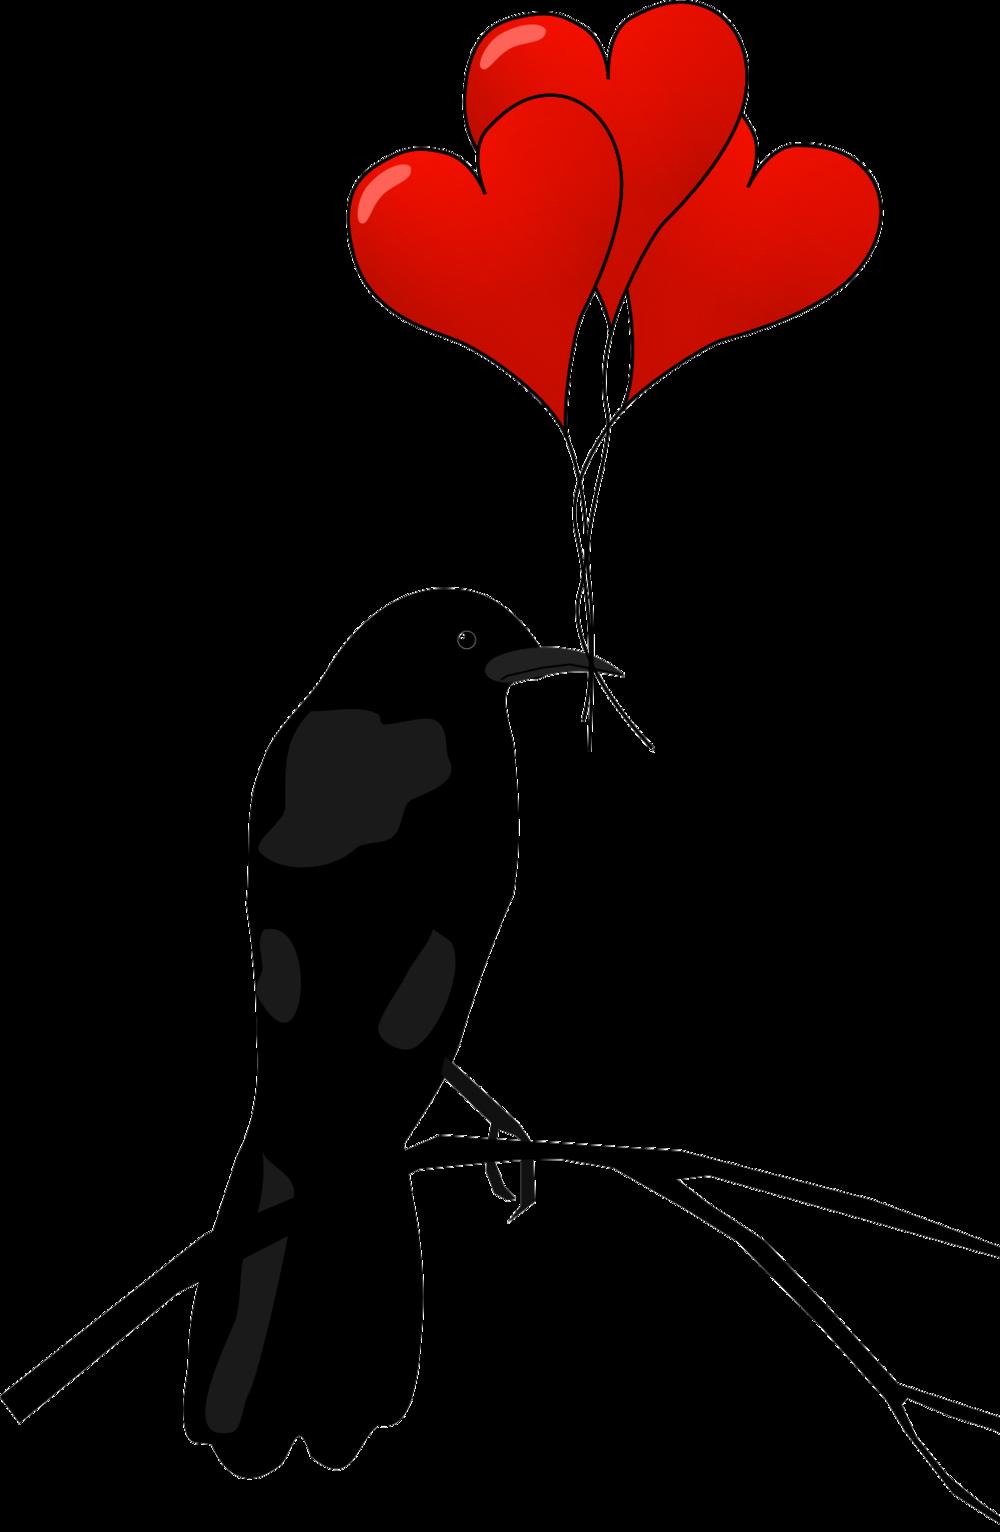 hummingbird-clipart-heart-6.png